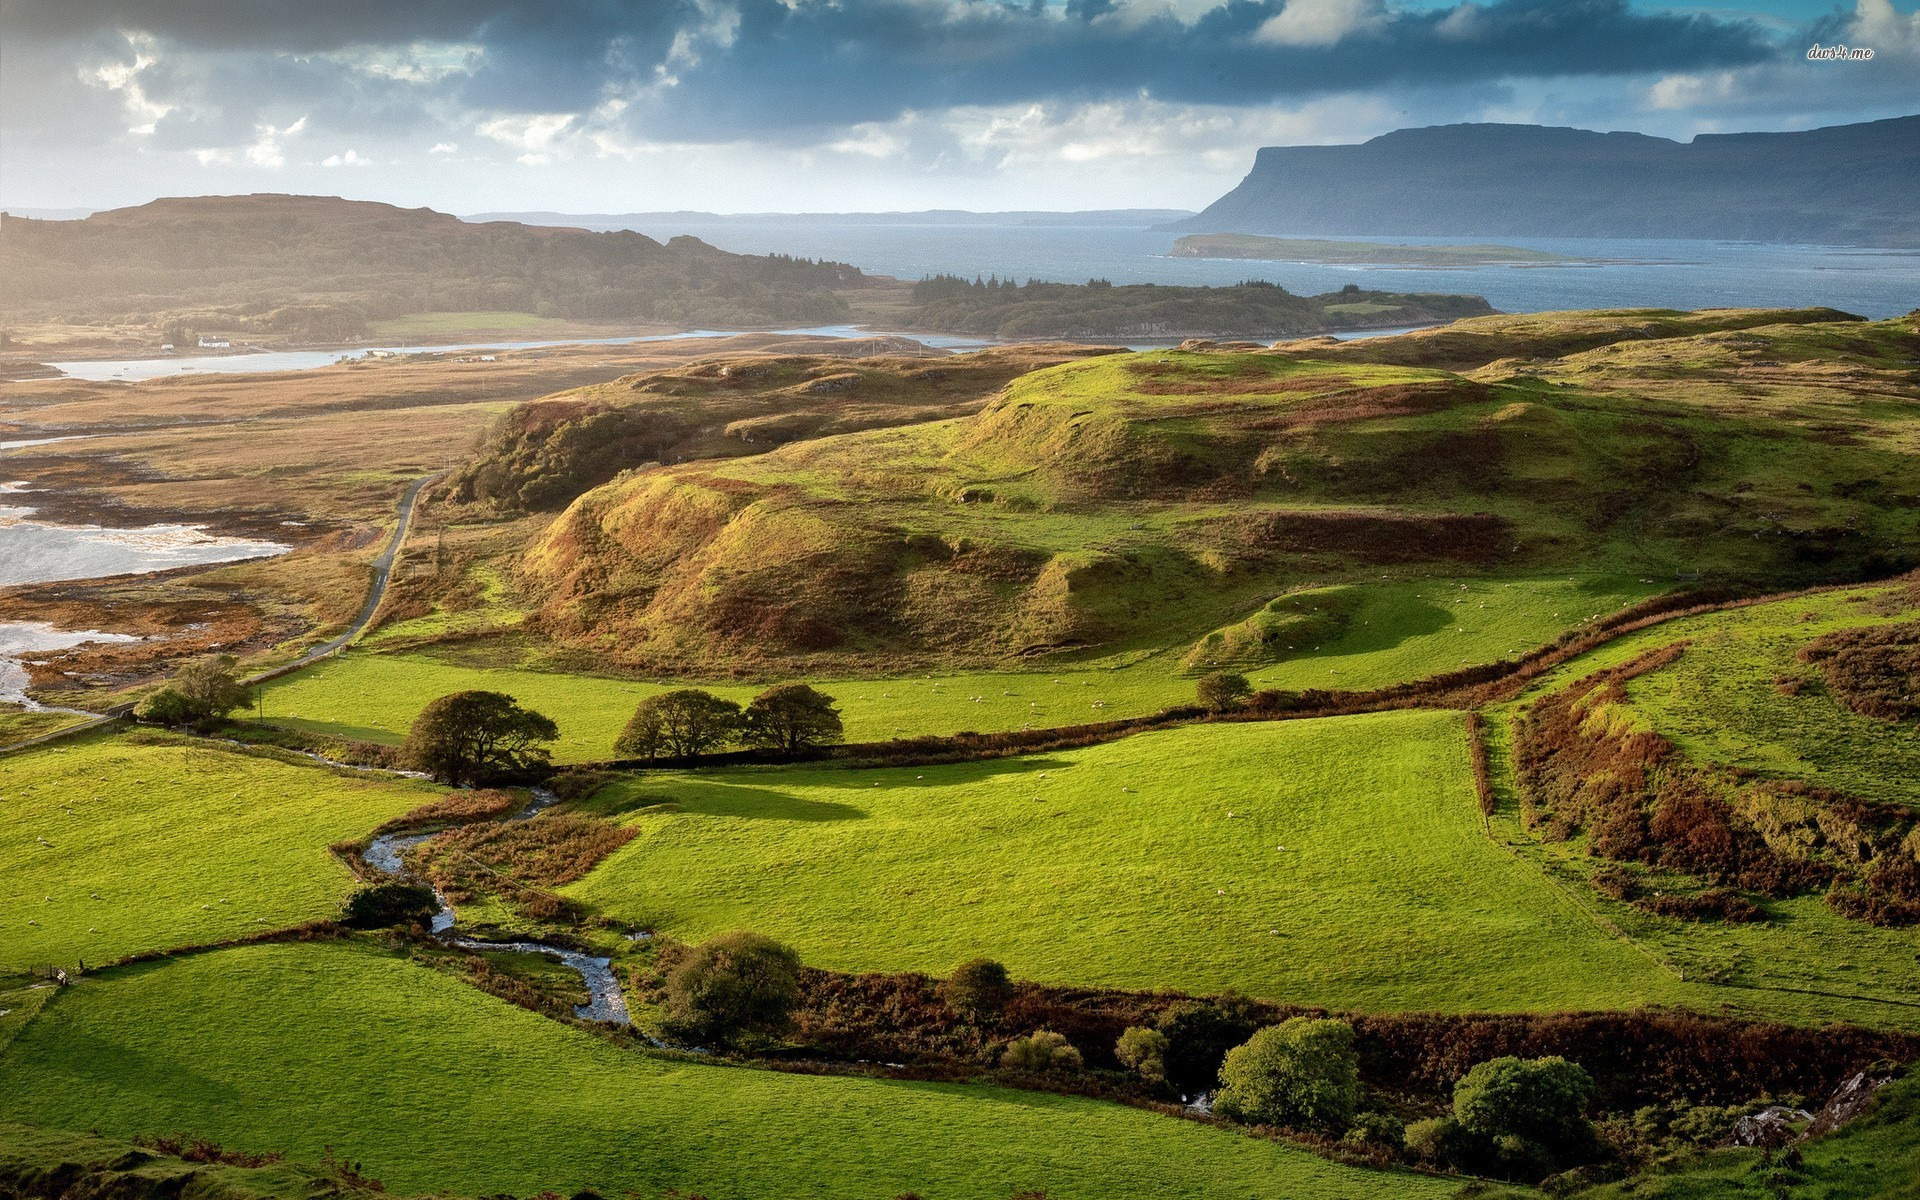 Free Download Isle Of Mull Scotland Wallpaper Nature